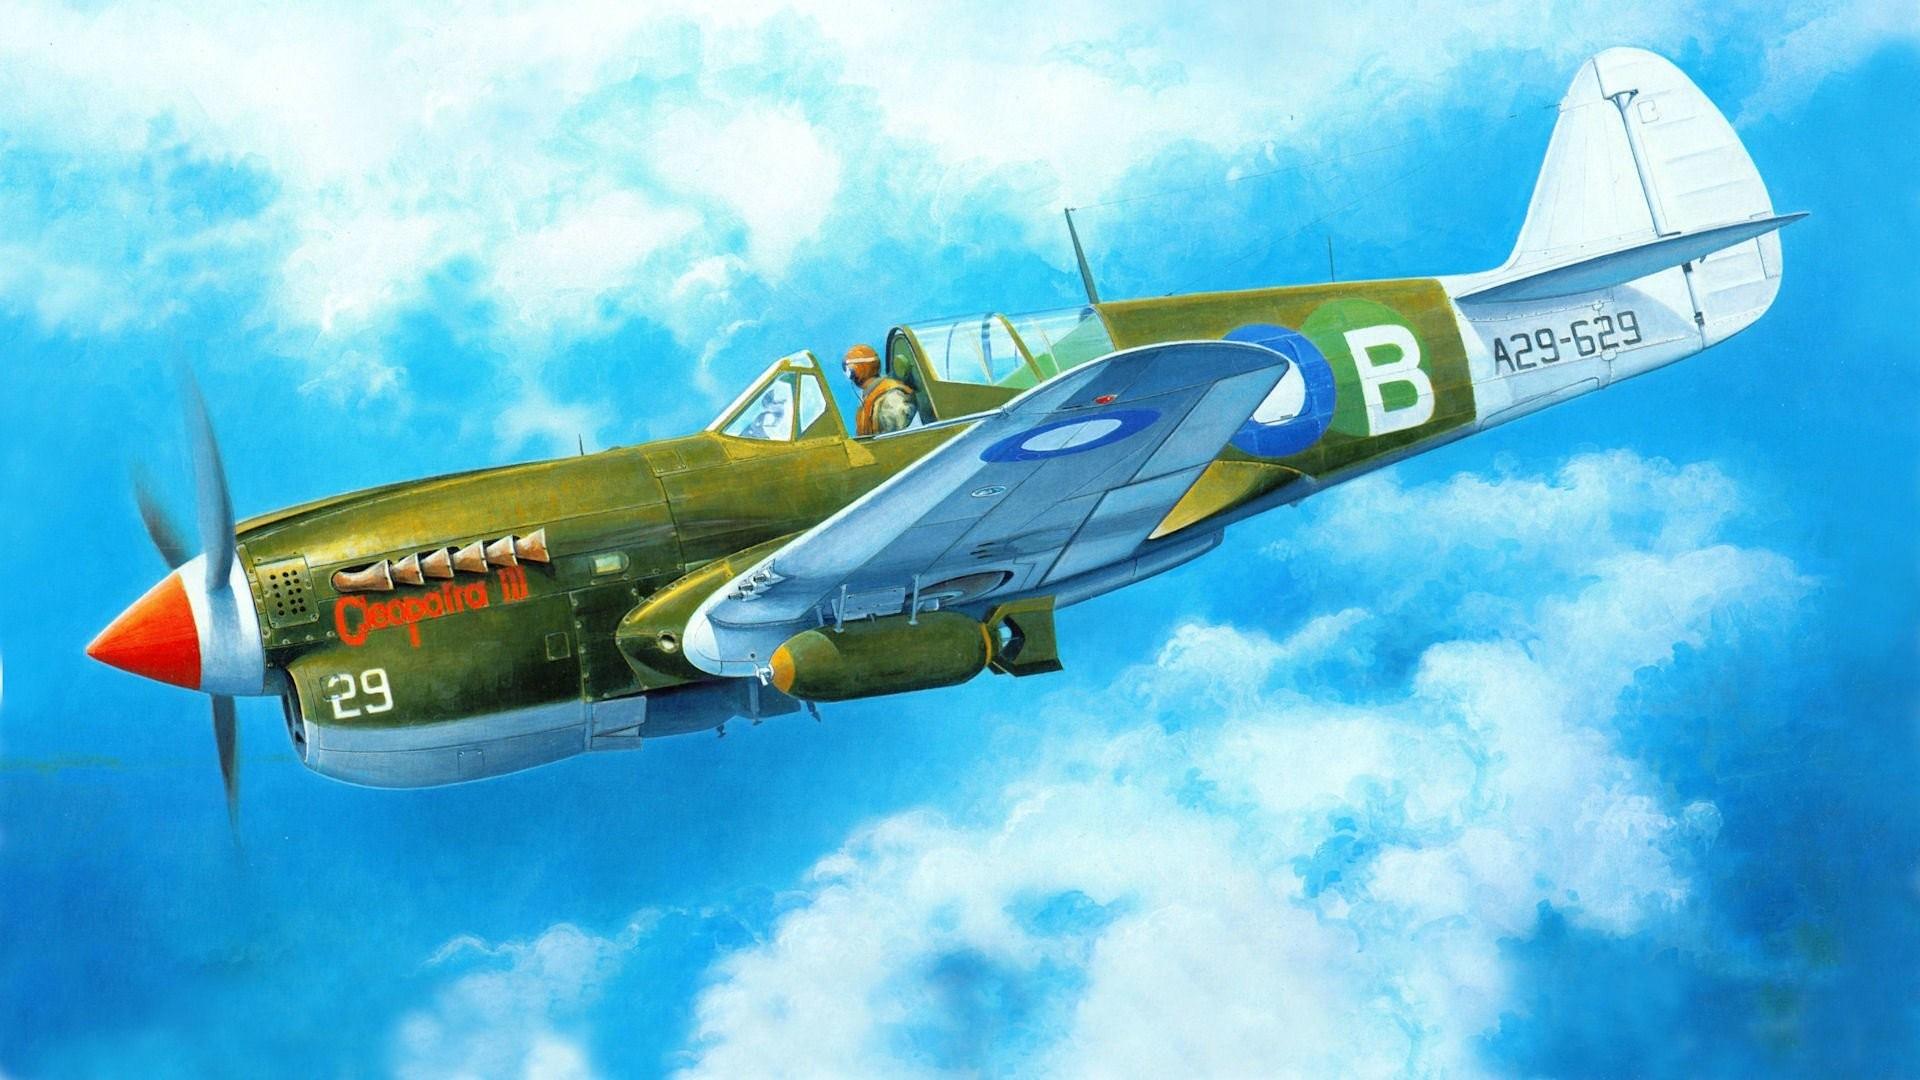 art plane curtiss p-40 warhawk tomahawk kittyhawk american fighter ww2.